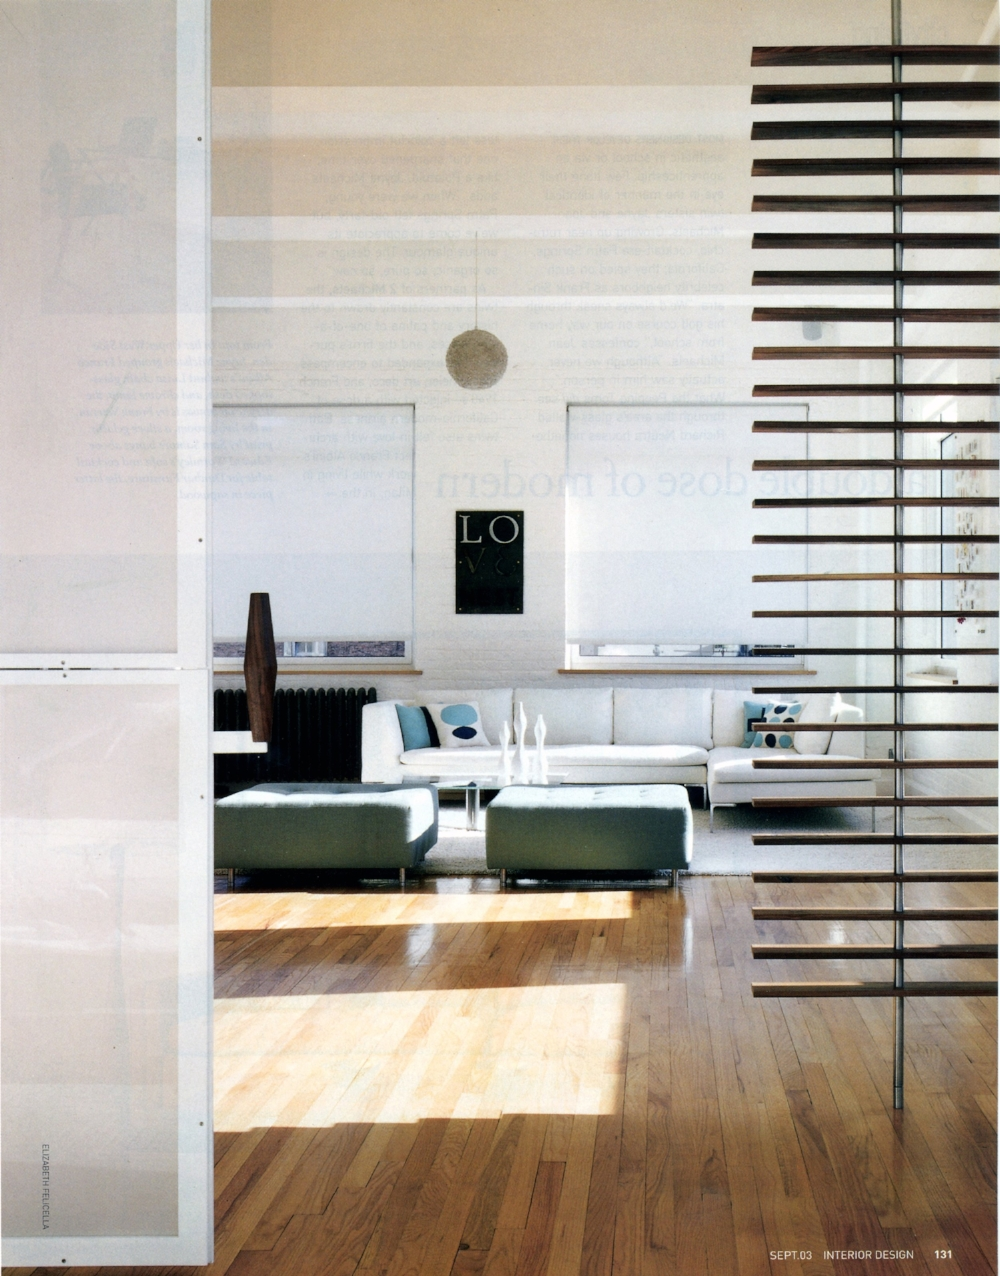 interior design sep 03 03 (1).jpg